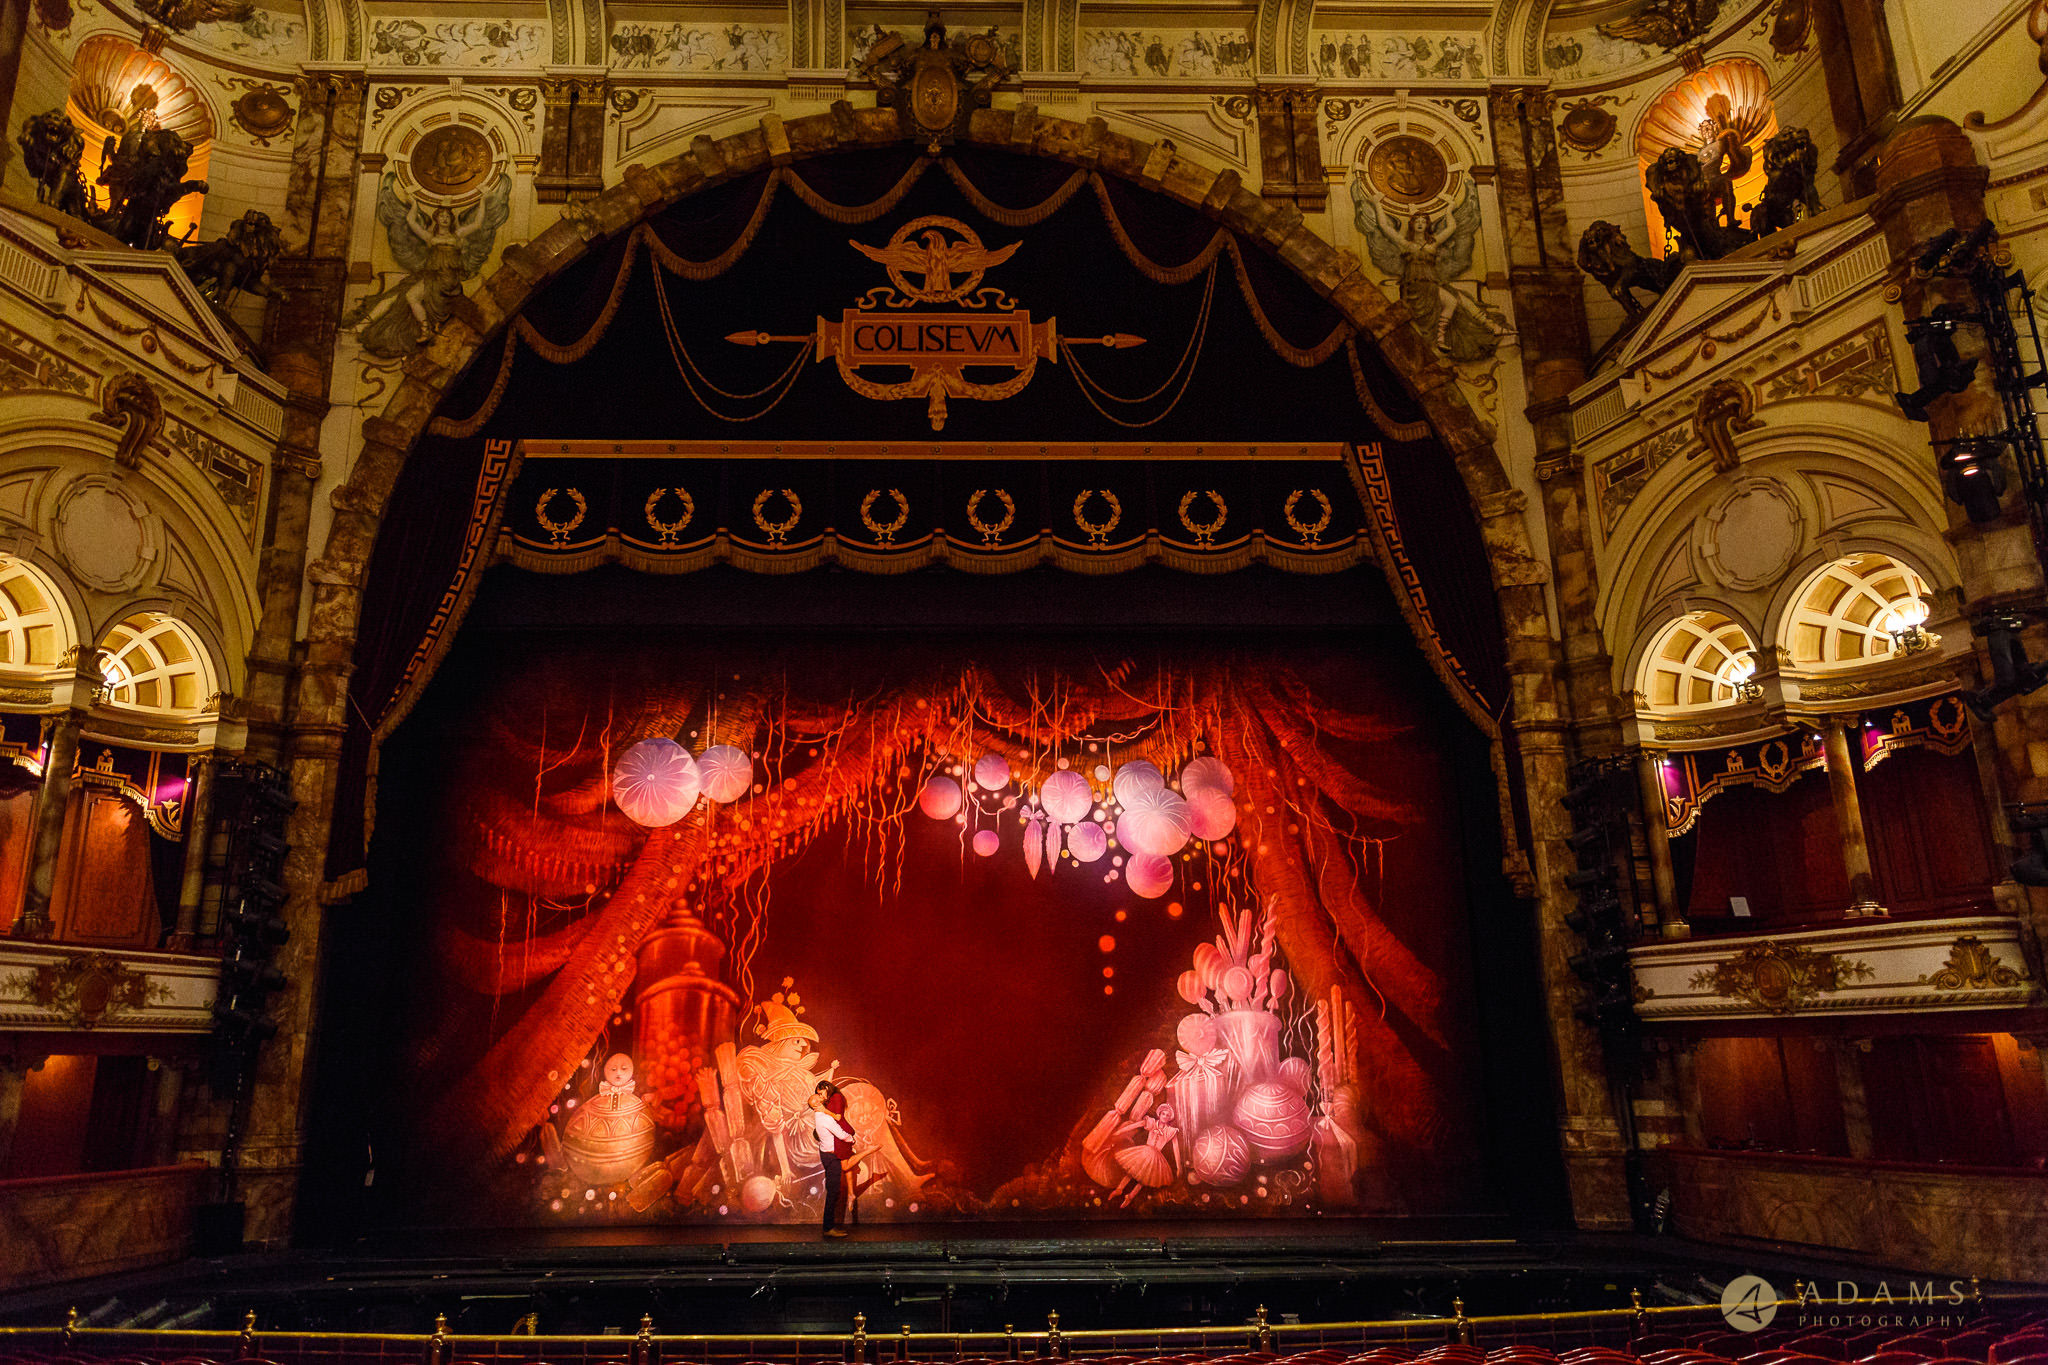 Surprise Engagement Proposal Coliseum ENO London on the stage